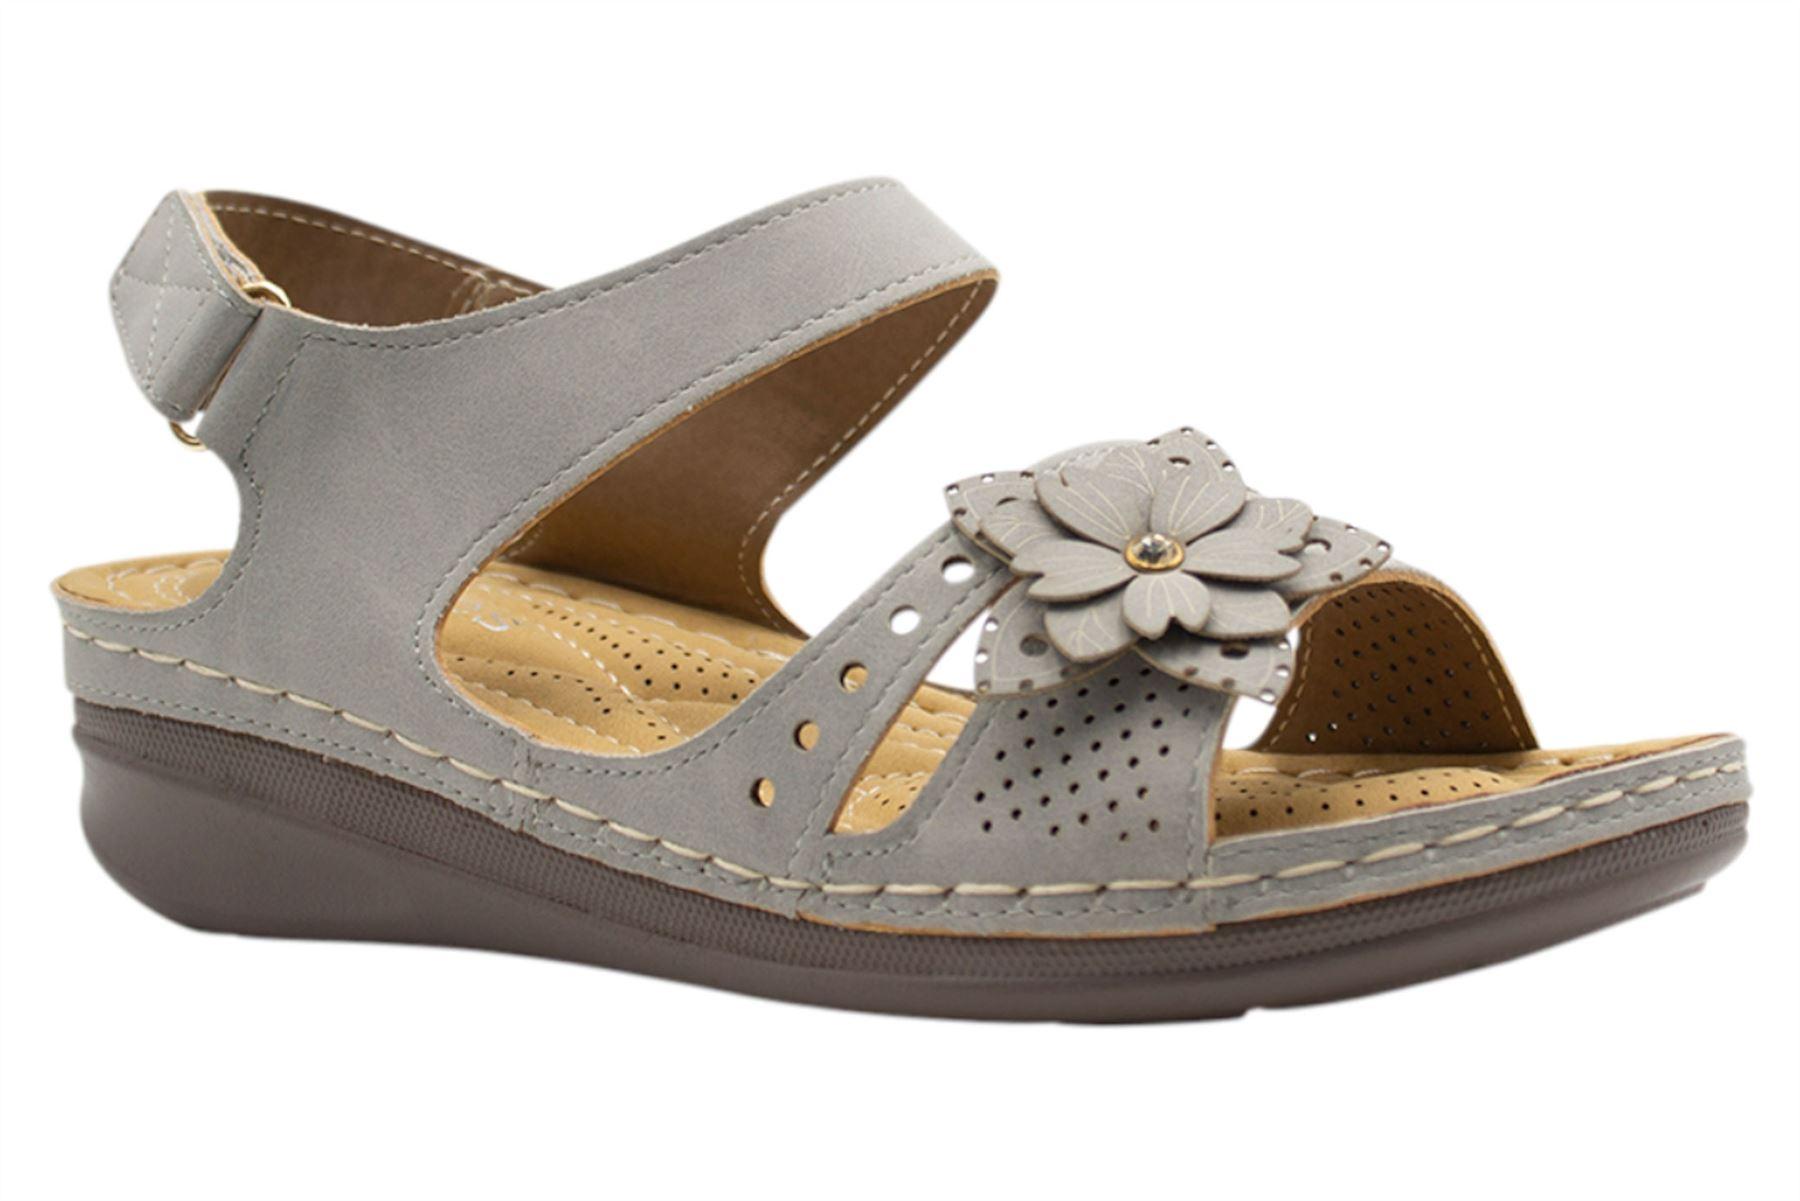 Ladies-Wedge-Heel-Sandal-Womens-Comfort-Cushion-Strapy-Summer-Shoes miniatura 28